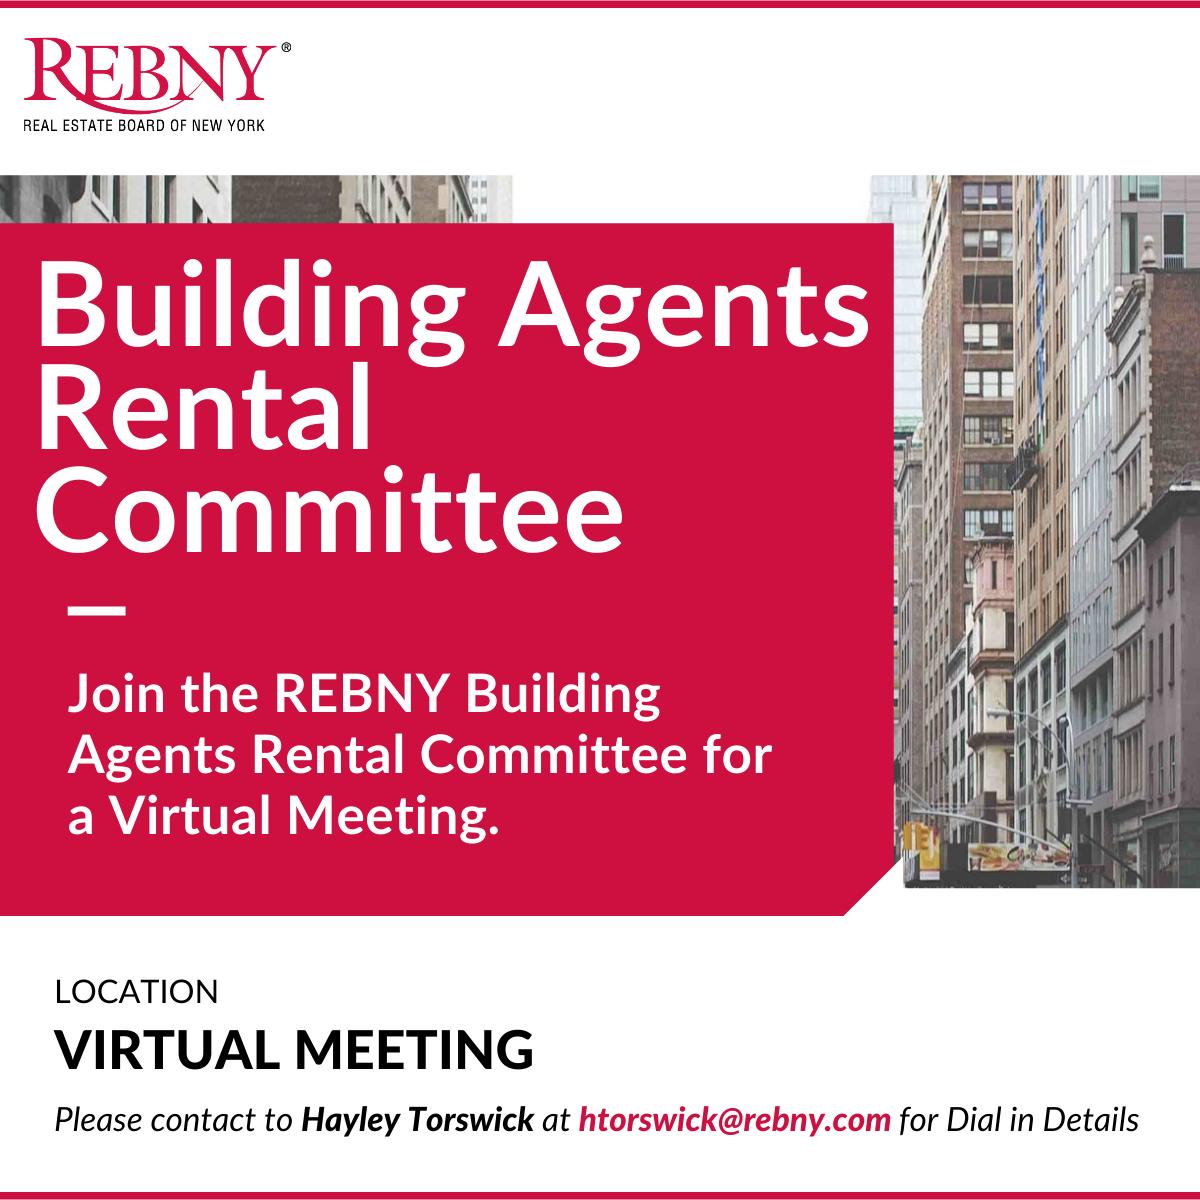 Virtual Commercial Brokerage Building Agents Rental Committee Meeting